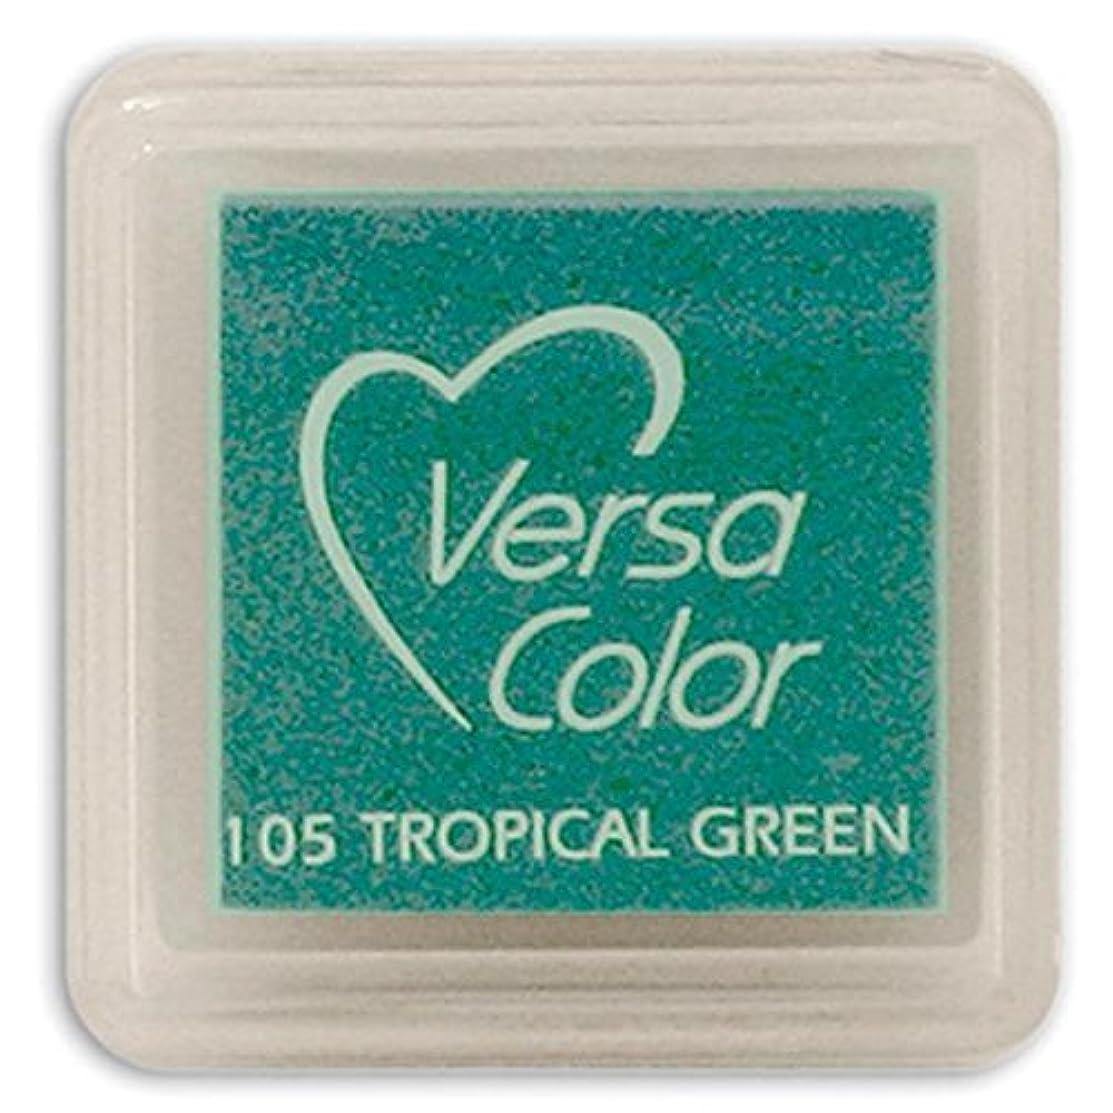 Tsukineko Small-Size VersaColor Ultimate Pigment Inkpad, Tropical Green